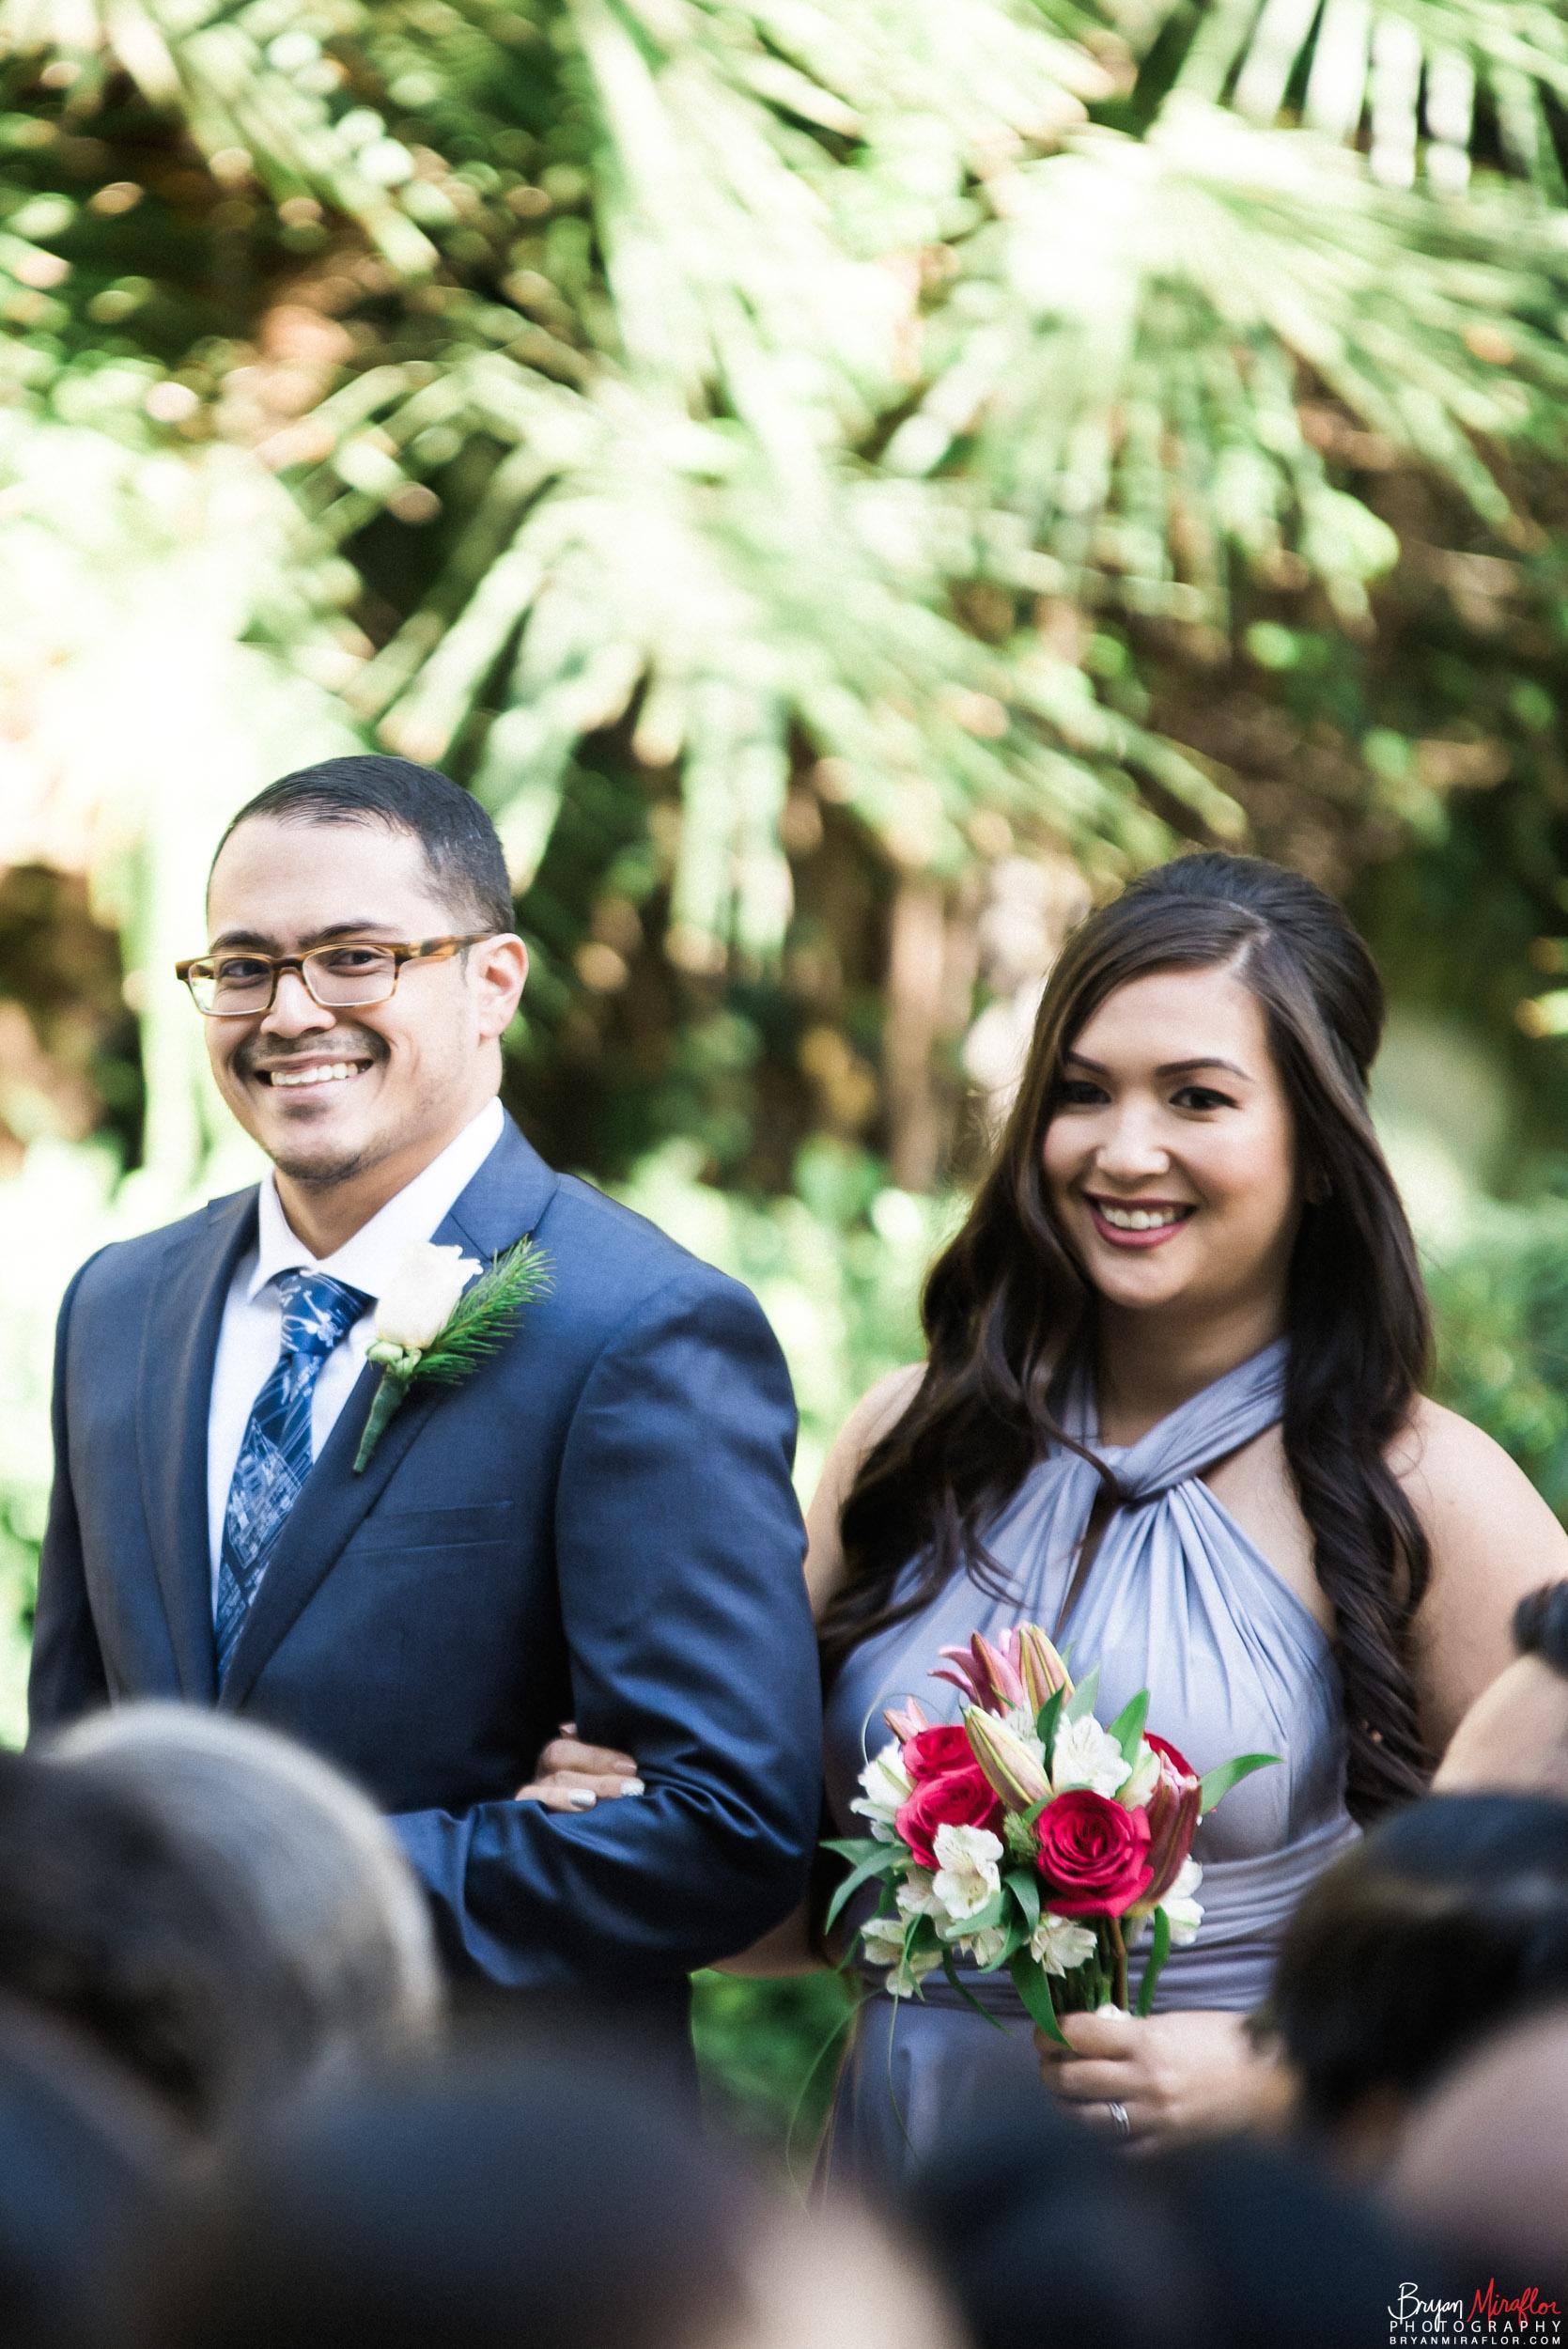 Bryan-Miraflor-Photography-Hannah-Jonathan-Married-Grand-Traditions-Estate-Gardens-Fallbrook-20171222-084.jpg